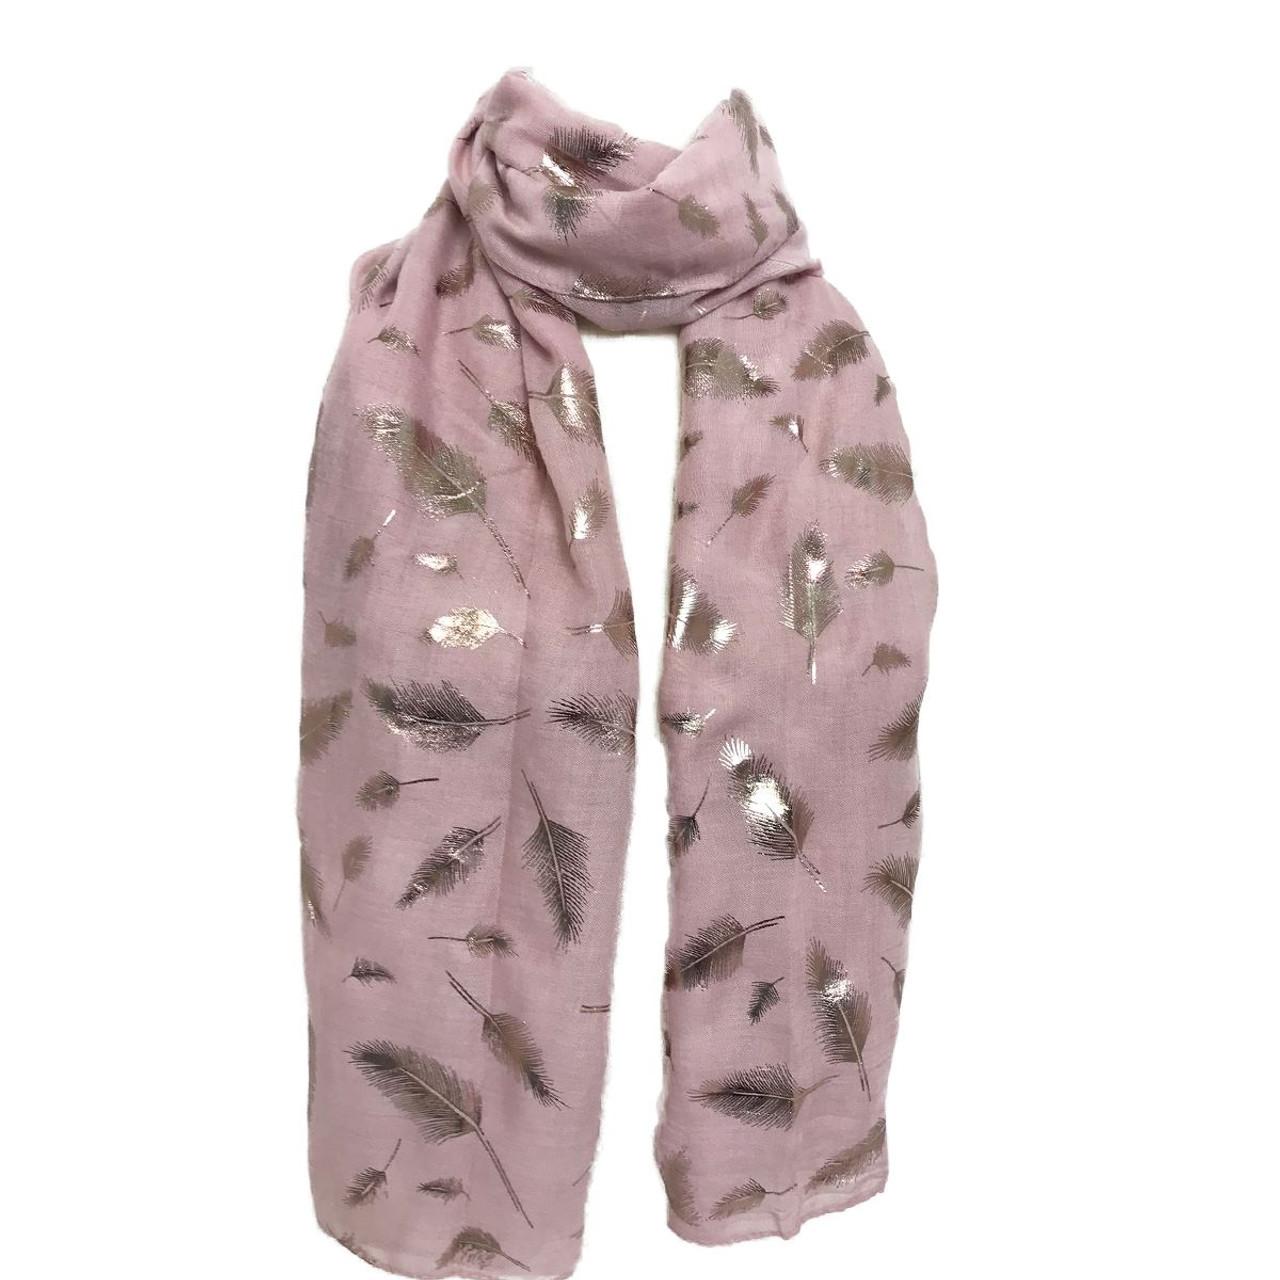 79ccc2501b1 Rose gold metallic feather print scarf YQ-1205-0610